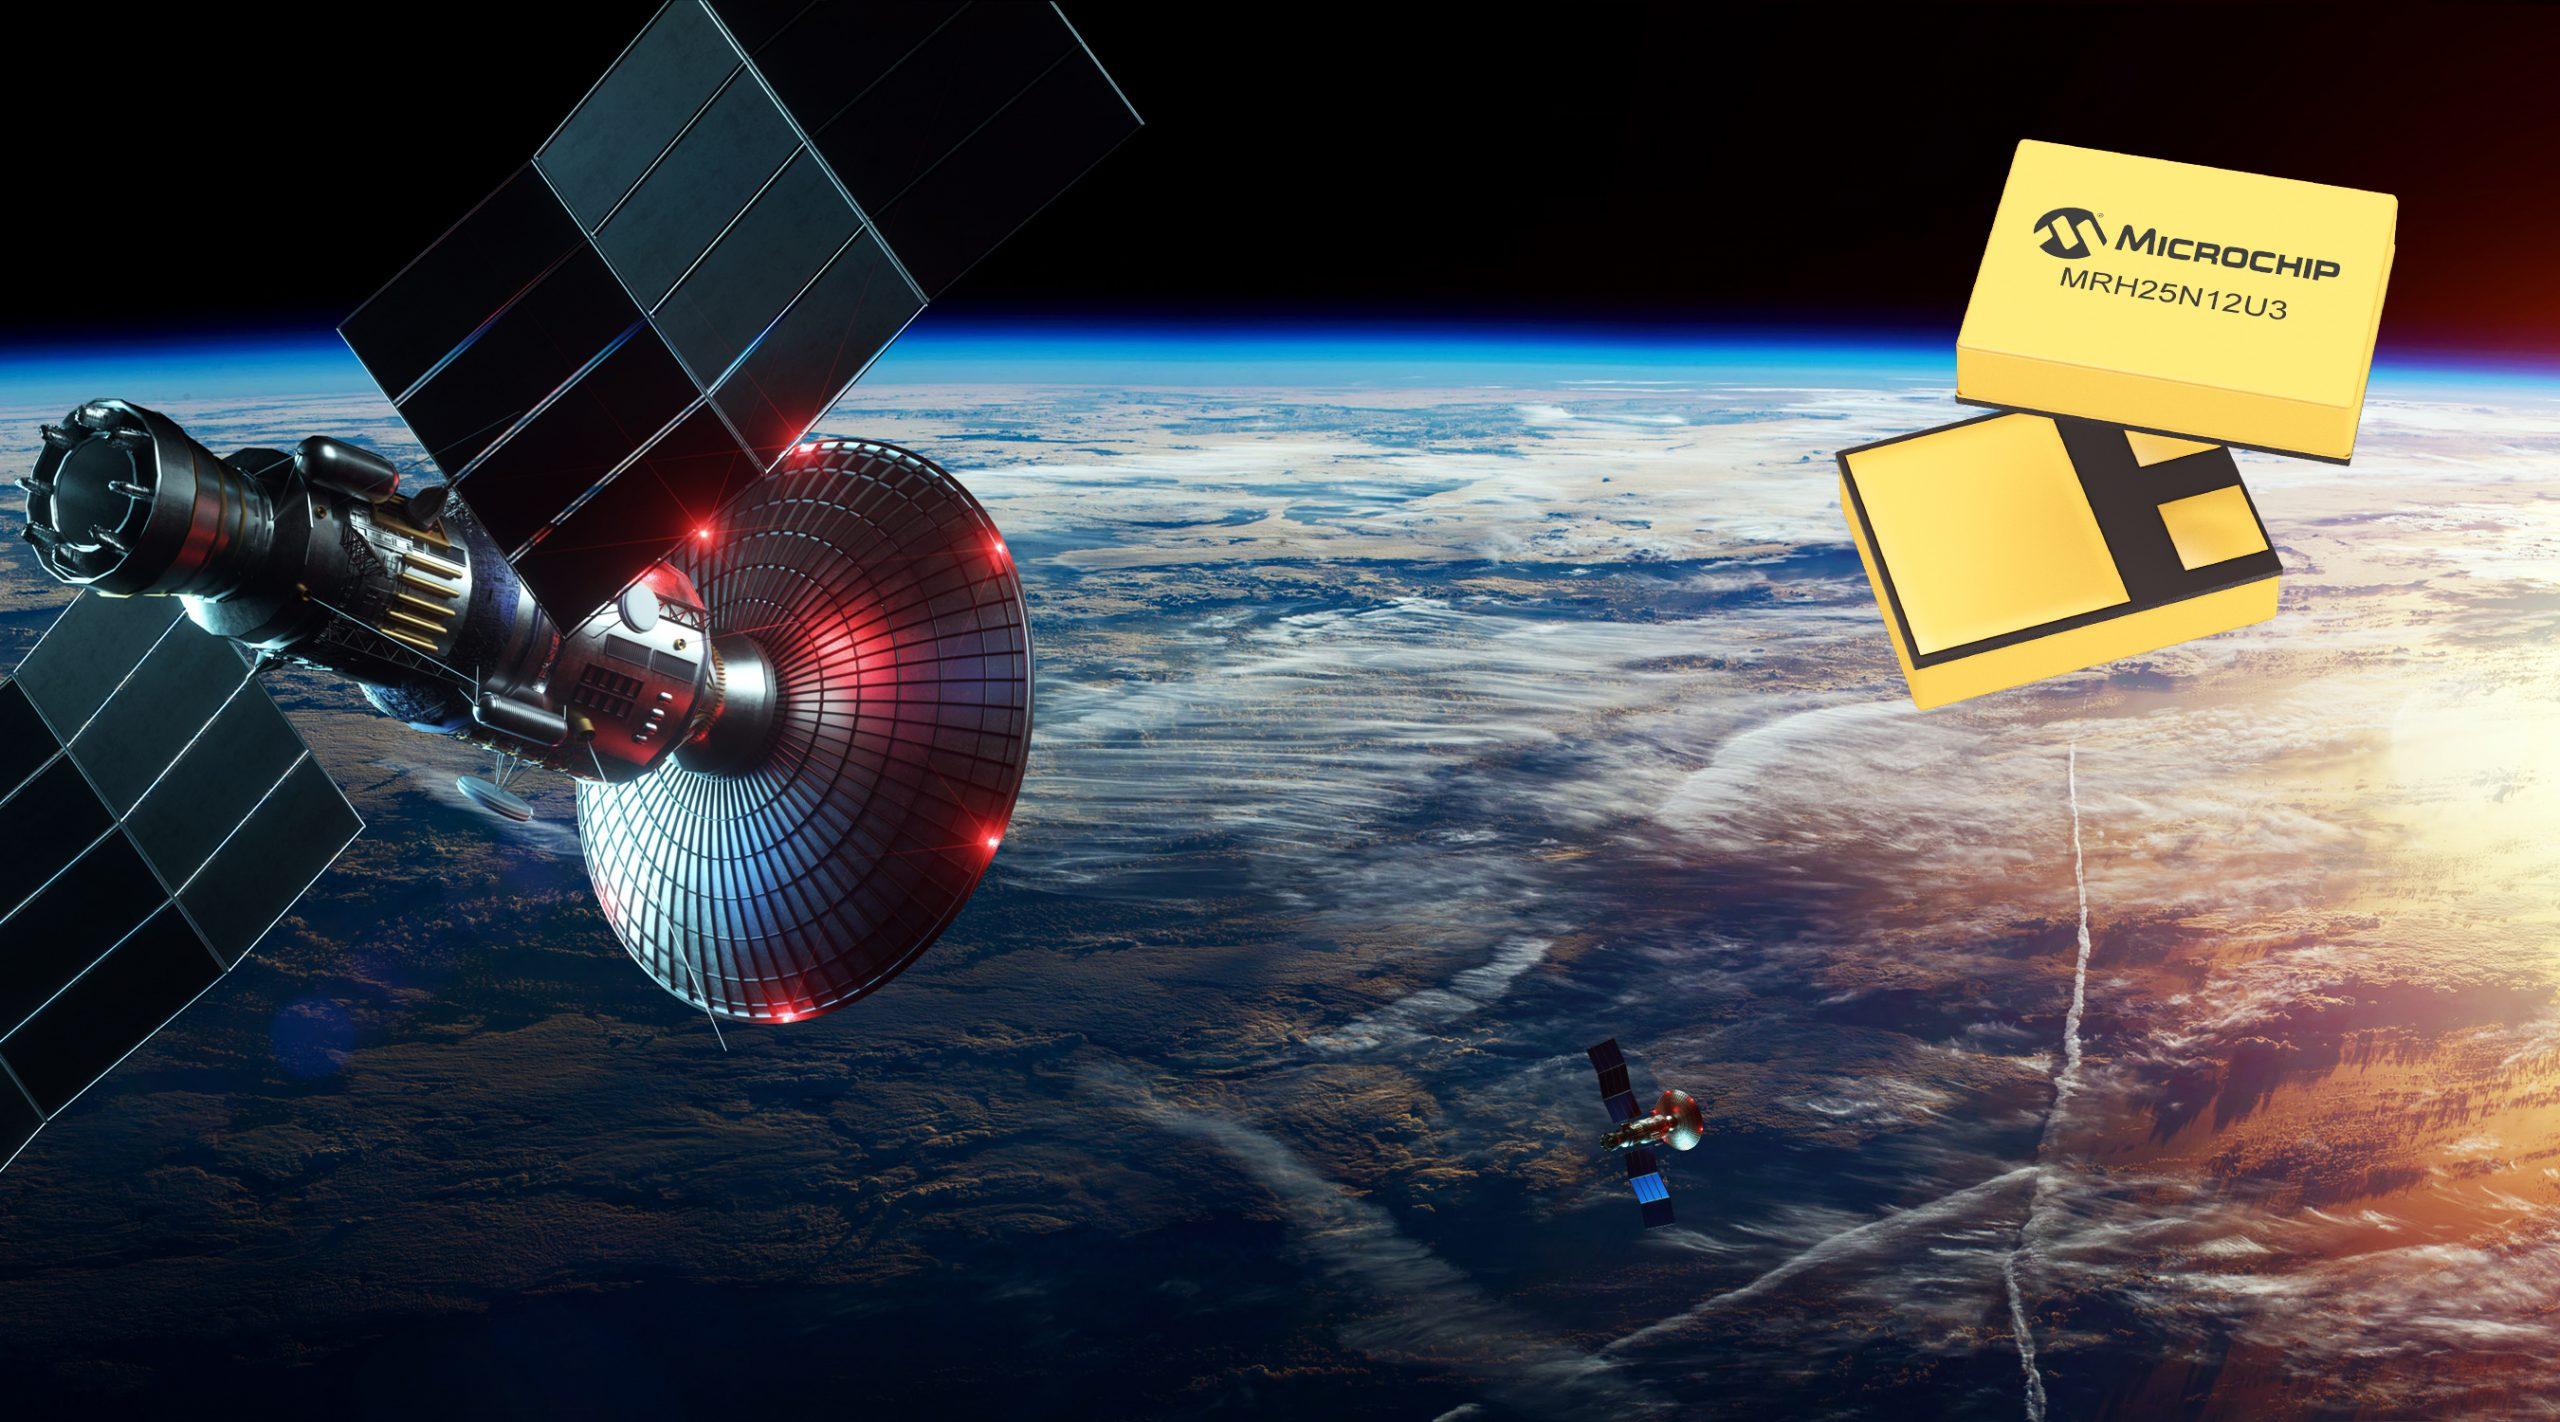 Microchip抗辐射MOSFET获得商业和军用卫星及航空电源解决方案认证